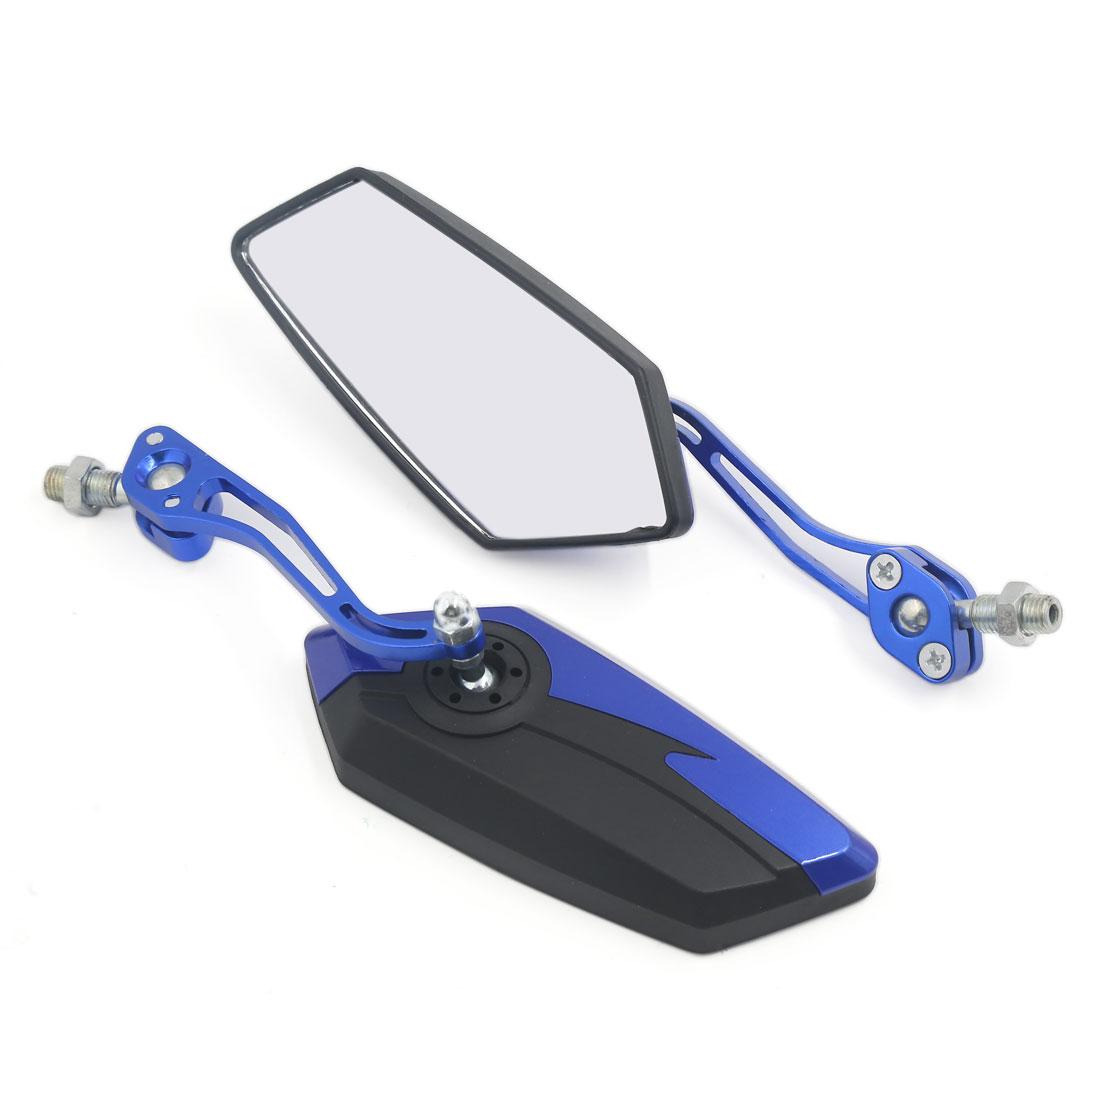 Pair 10mm 360 Degree Rotatable Motorcycle Bike Universal Rearview Mirror Blue Black